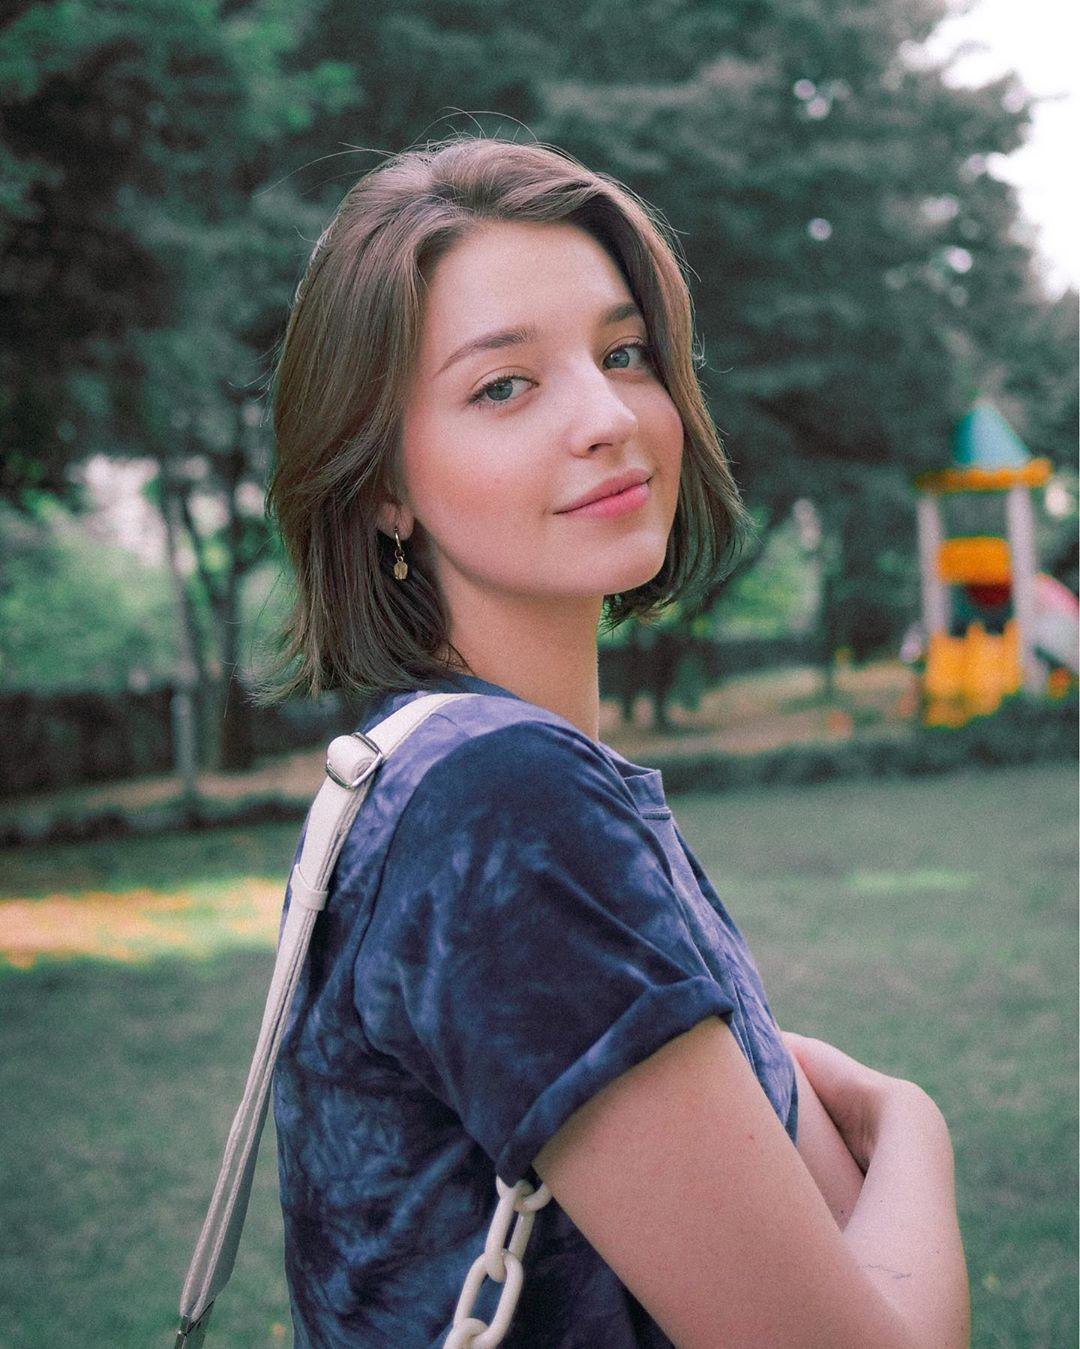 Данилова Анджелина, Анджелина, Анджелина факты, Анджелина профиль, Анджелина высота